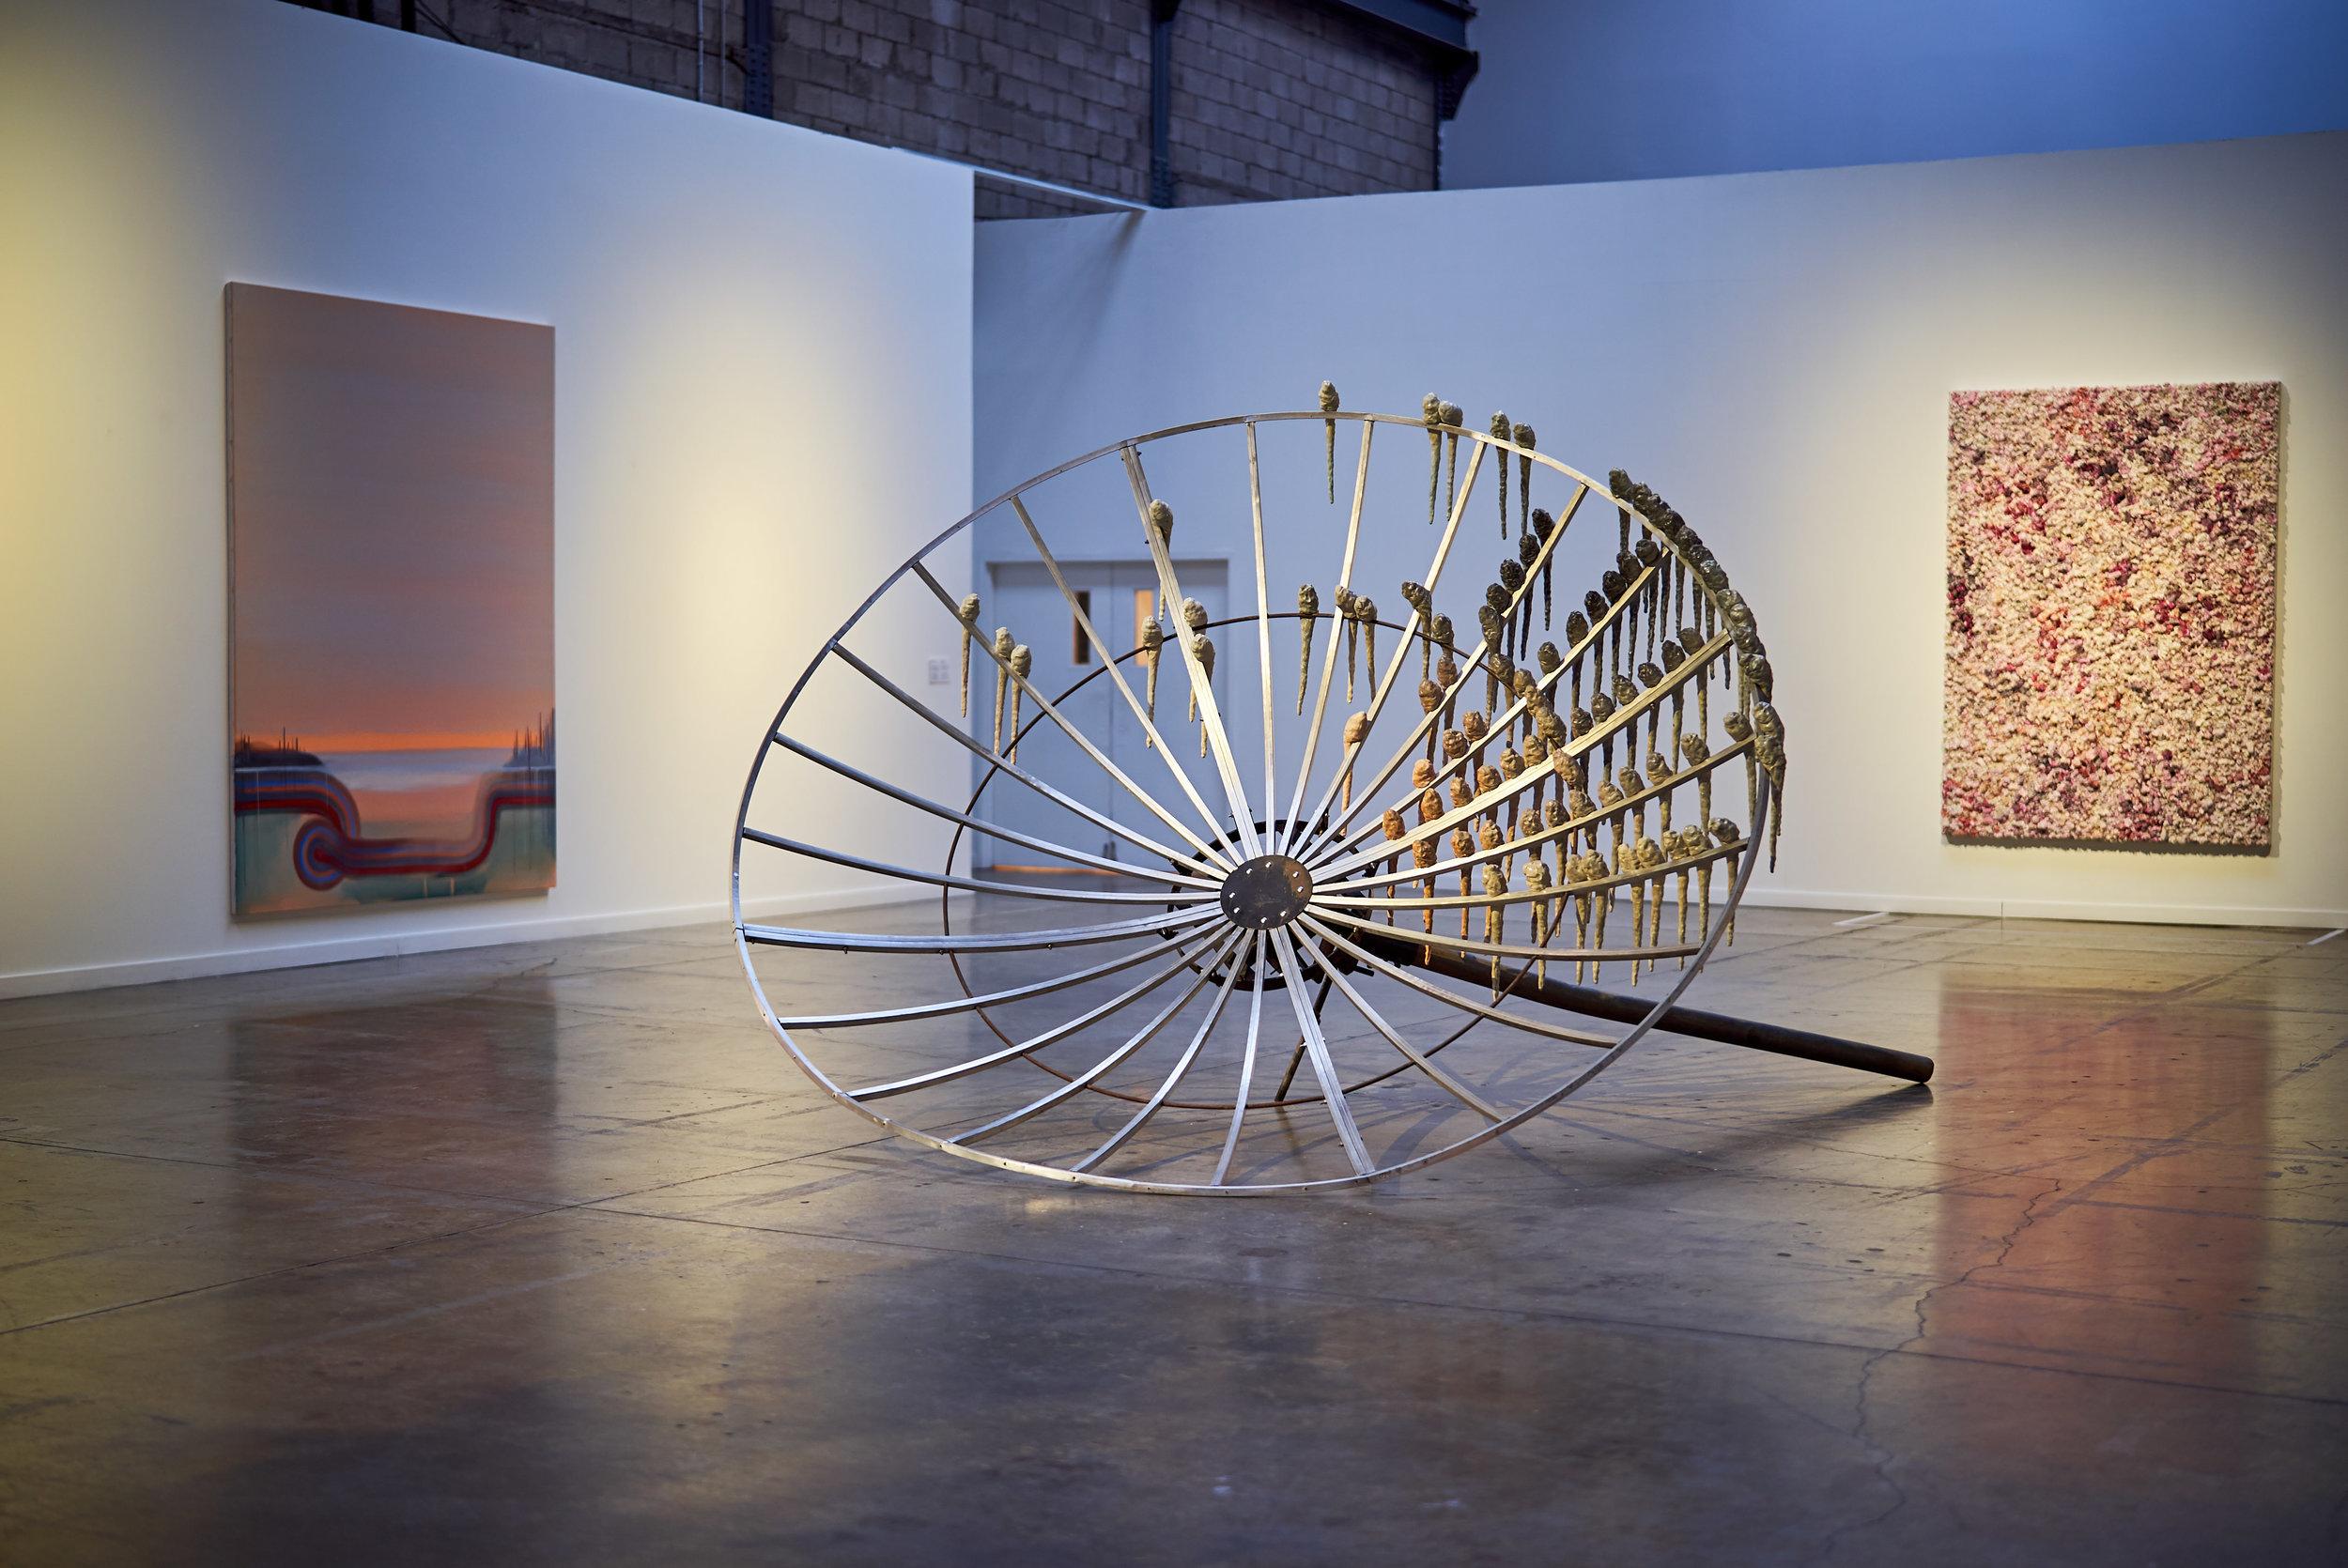 Kathleen Ryan ,  Satellite in Repose , 2018, Glazed ceramic, aluminium, steel, 123′′ x 92 ½′′ x 165 ½′′ (312,4 x 234,9 x 420,4 cm)